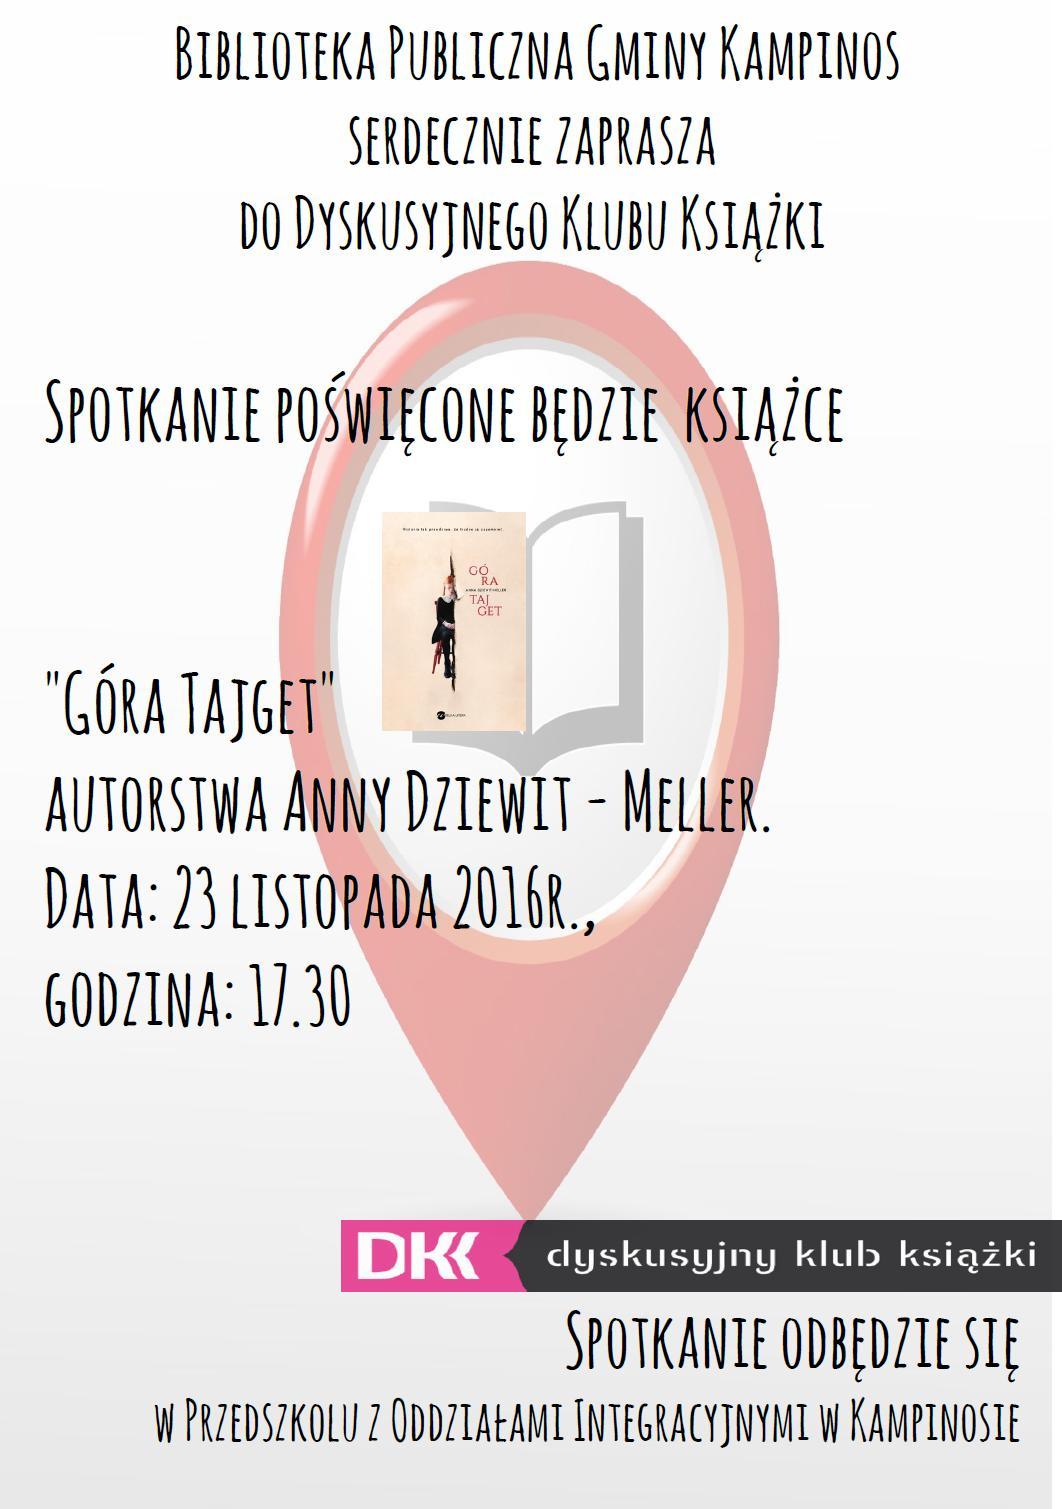 DKK_plakat_23_listopada